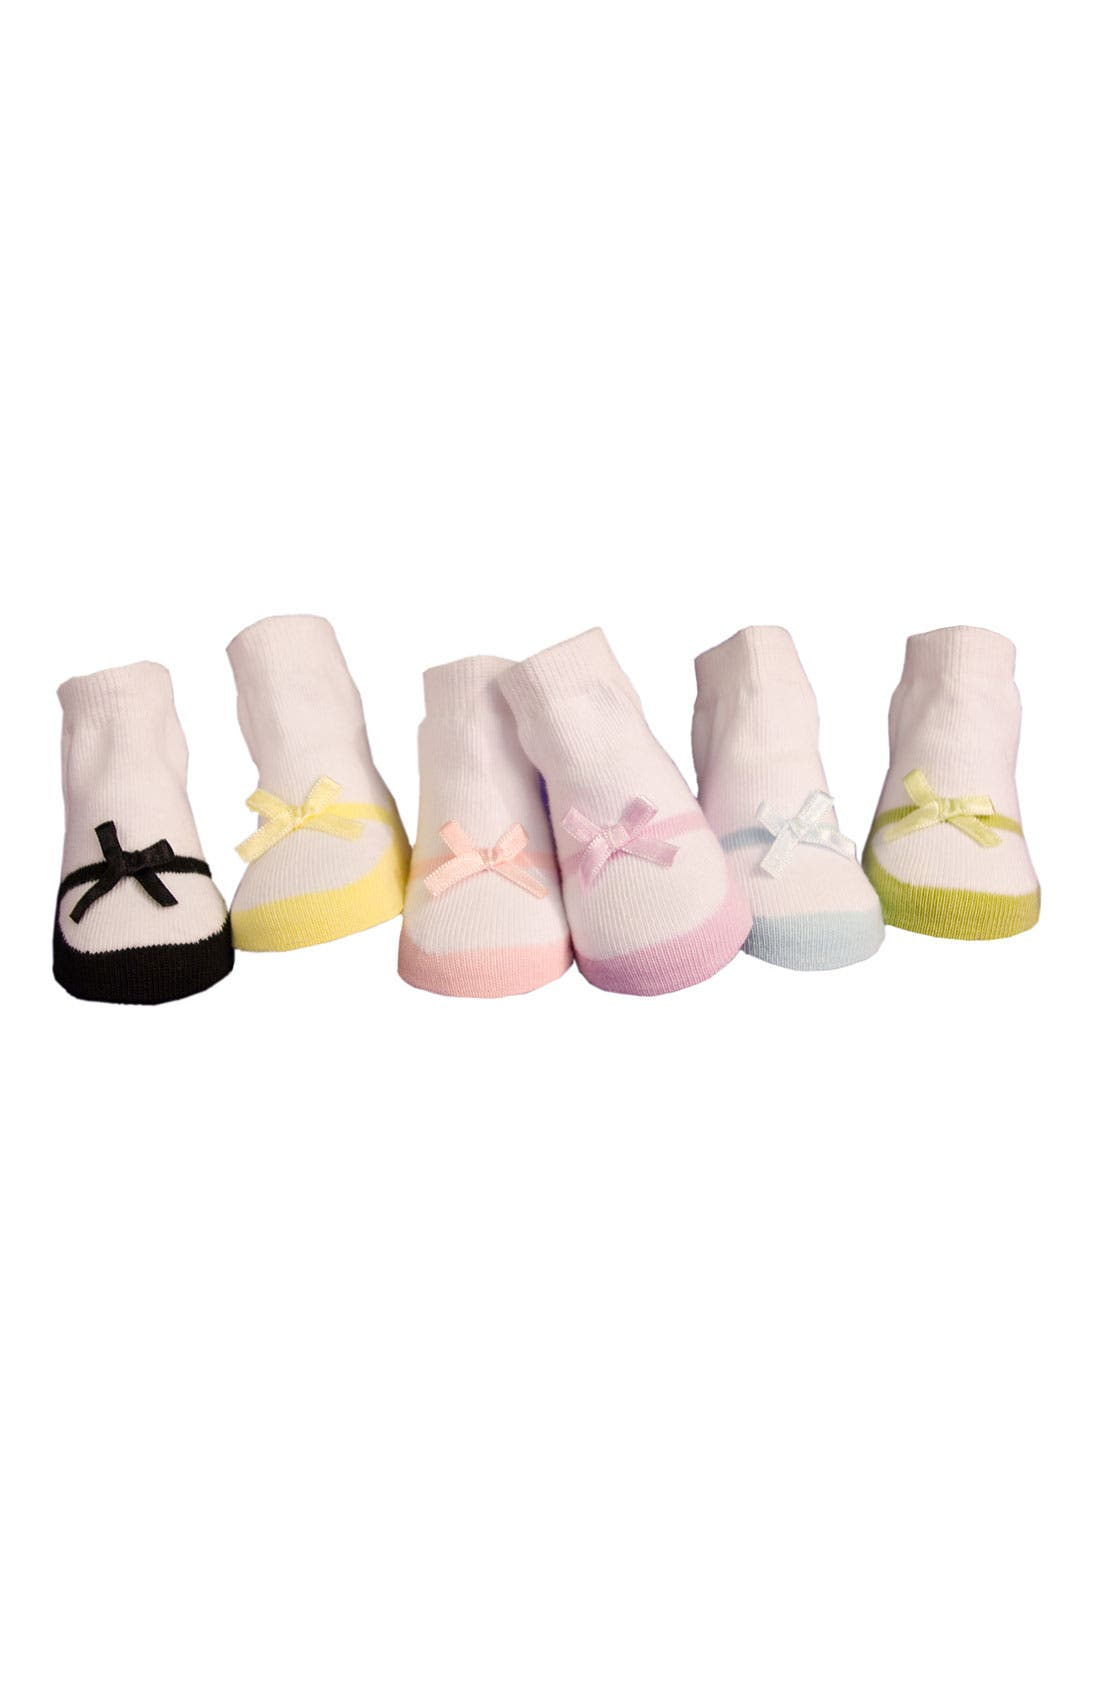 TRUMPETTE Socks Gift Set